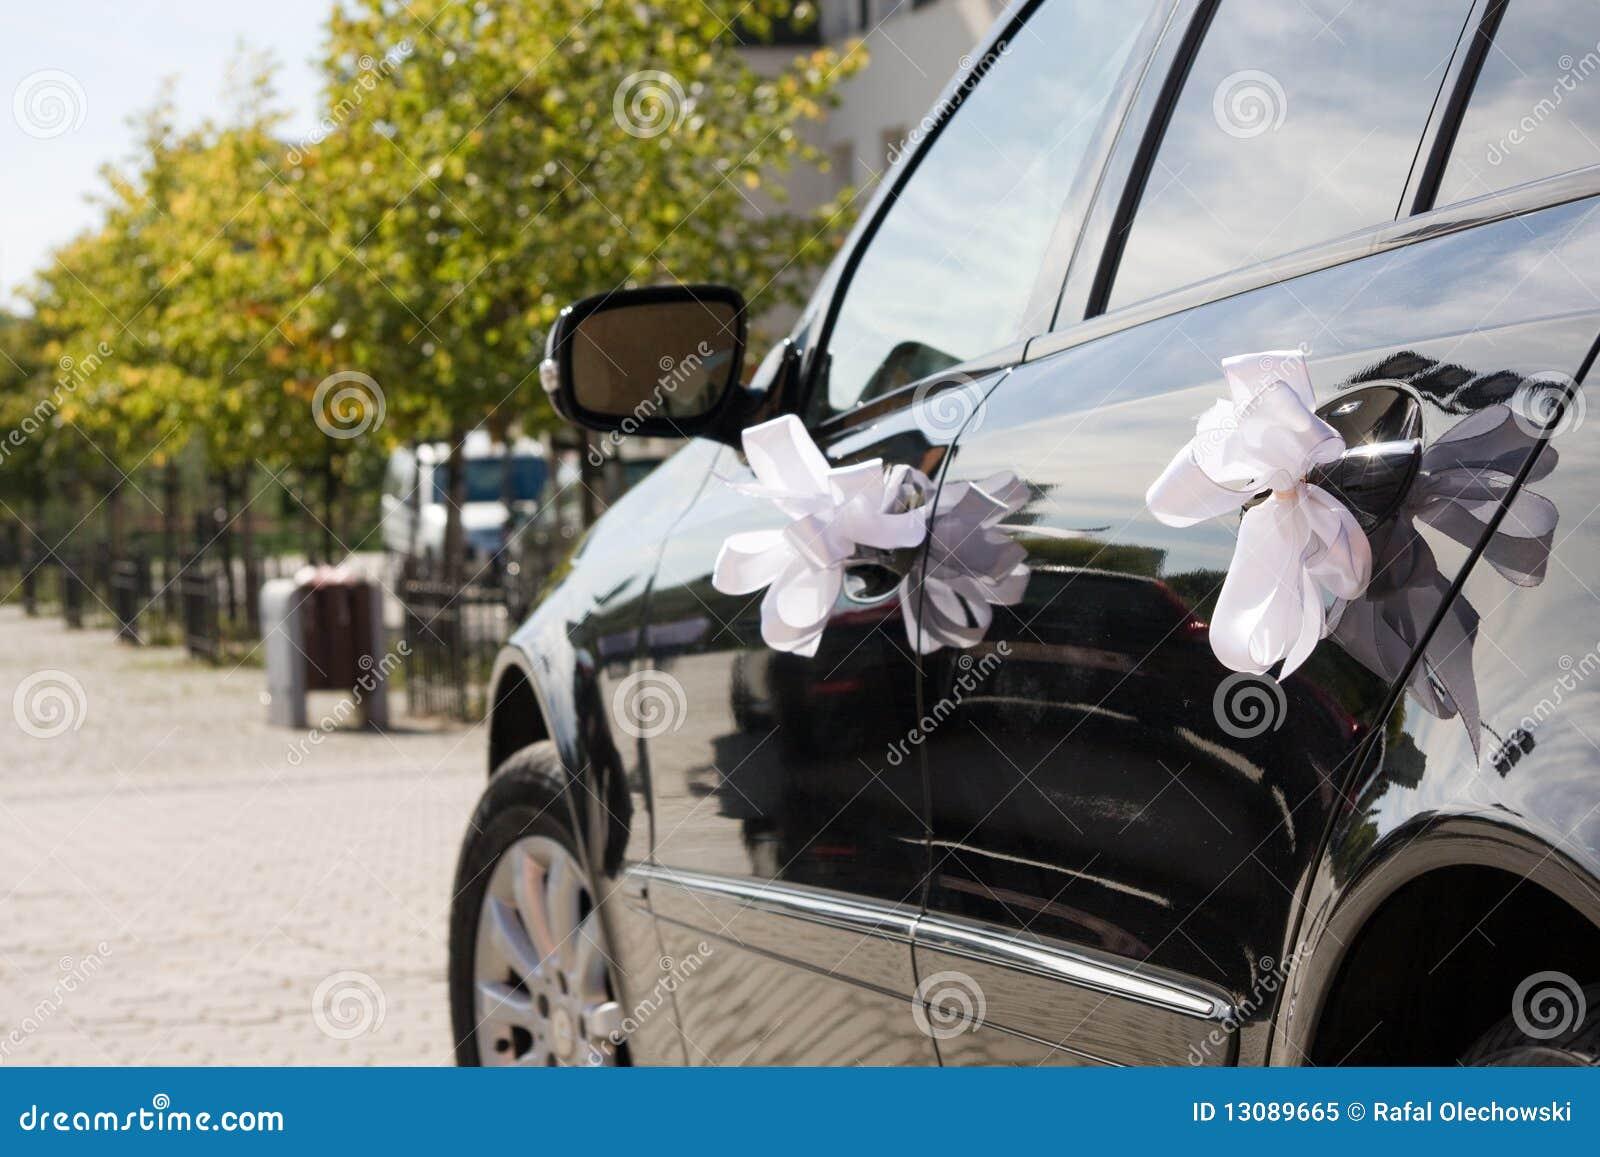 Wedding Car Decorated By Ribbons Stock Image Image Of Celebration